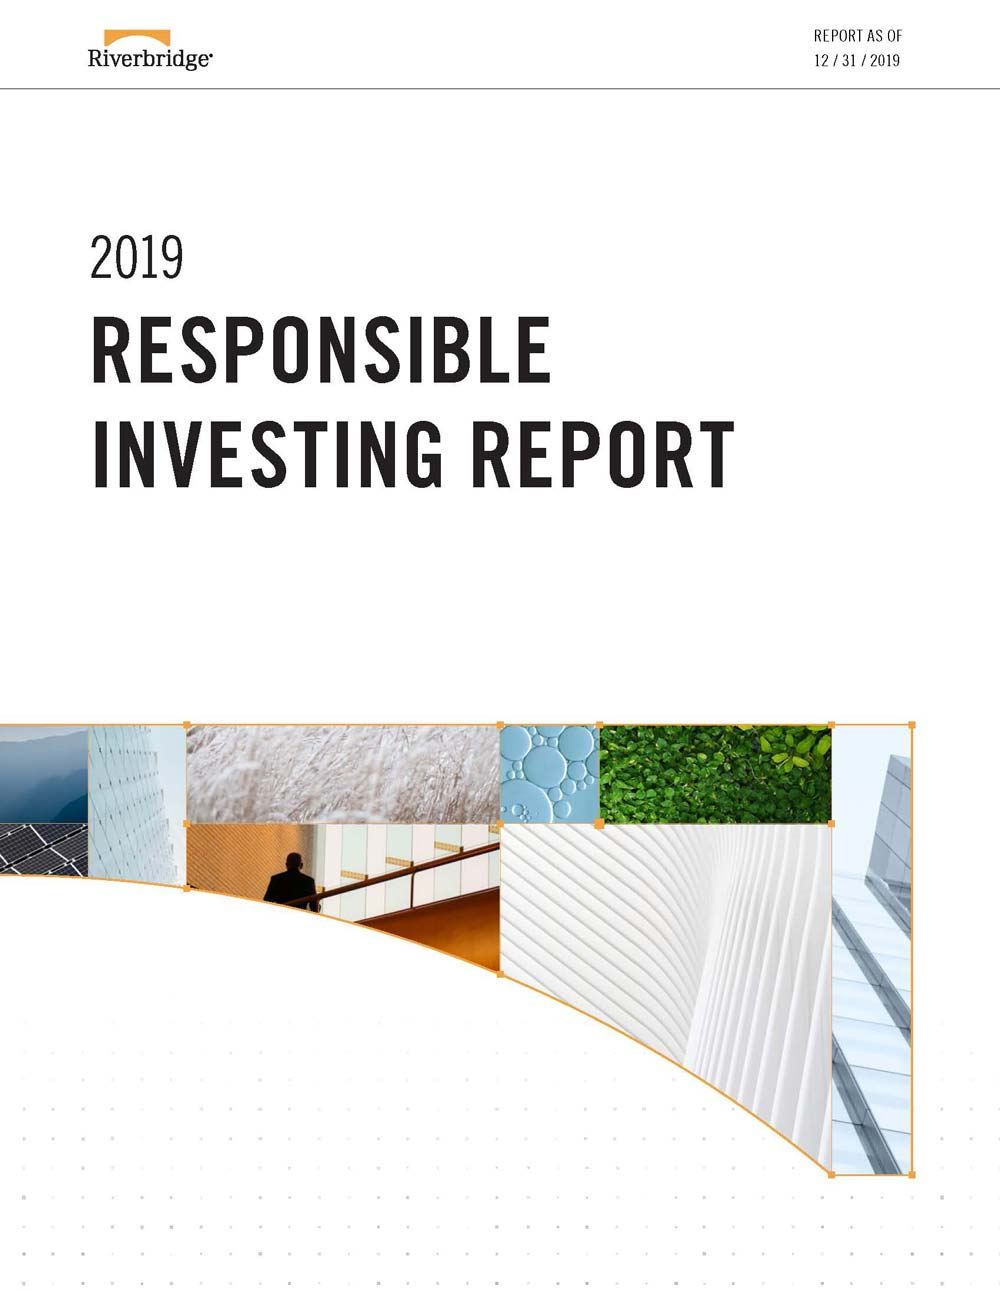 2019 Responsible Investing Report